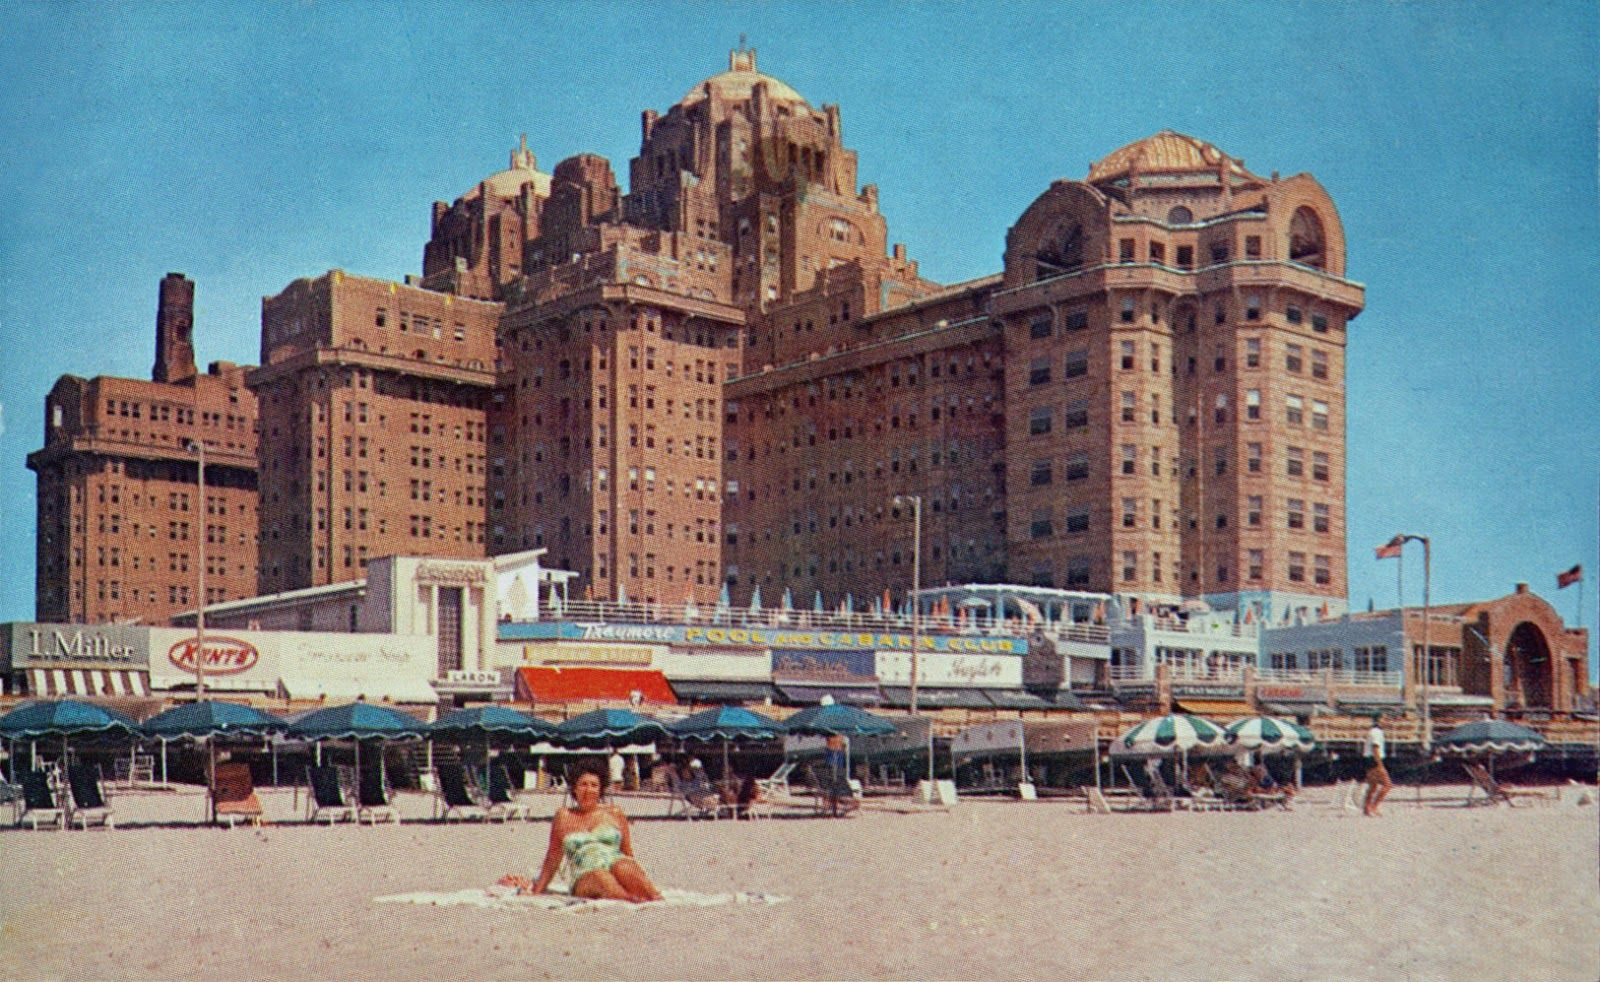 Hotel Traymore Atlantic City New Jersey Jpg Jpeg Image 1600 982 Pixels Atlantic City Hotels Atlantic City Atlantic City Boardwalk